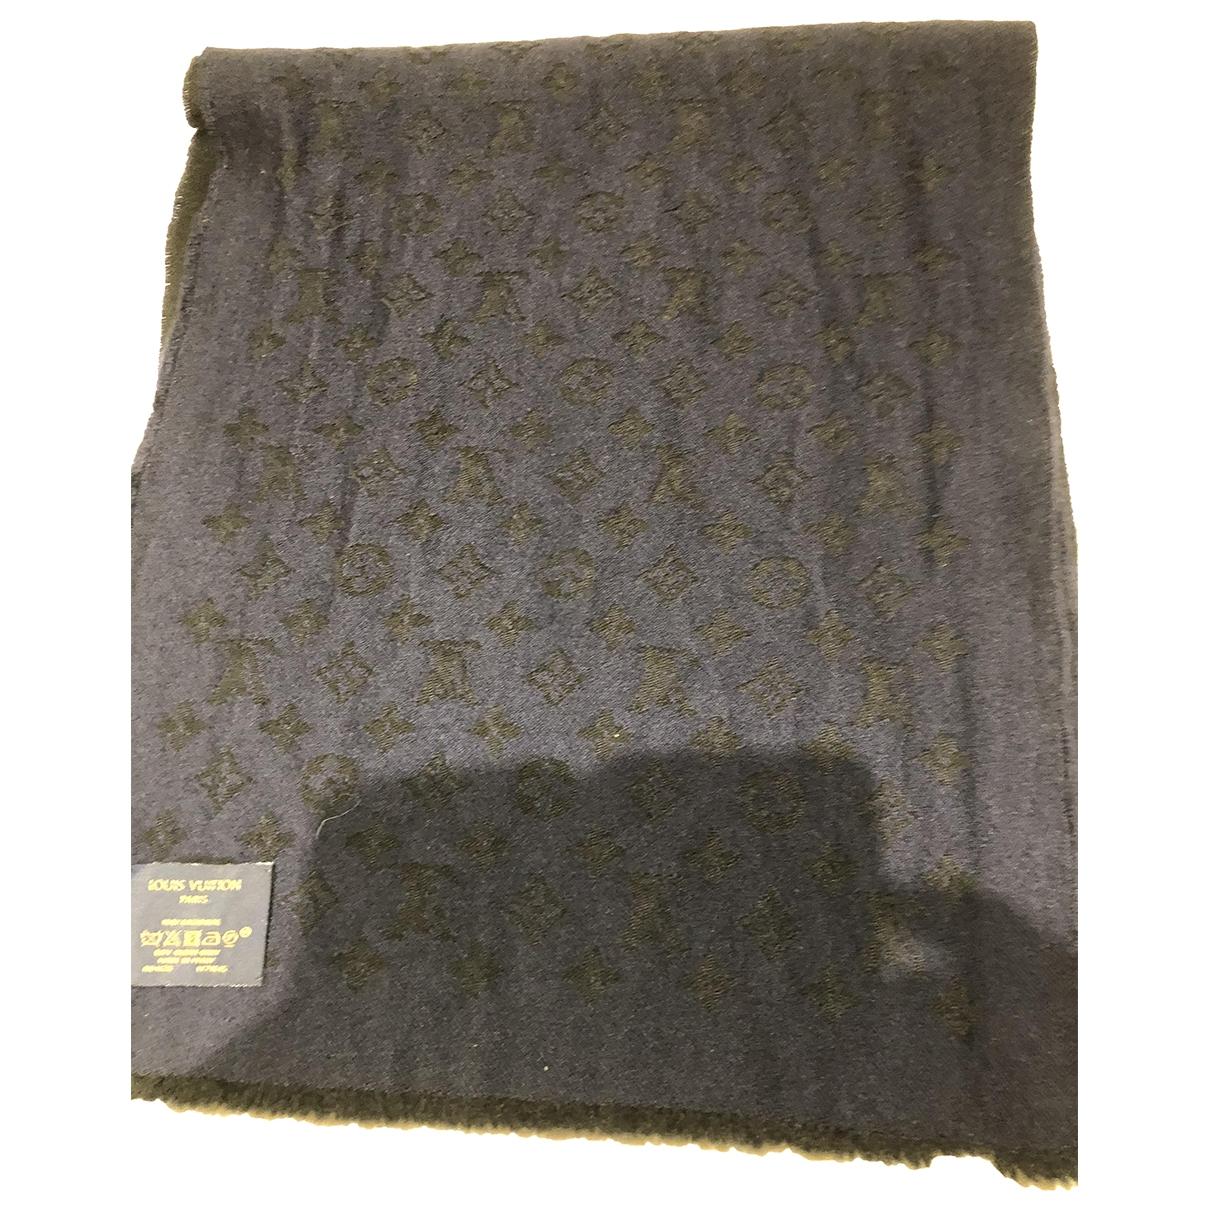 Louis Vuitton \N Navy Cashmere scarf & pocket squares for Men \N